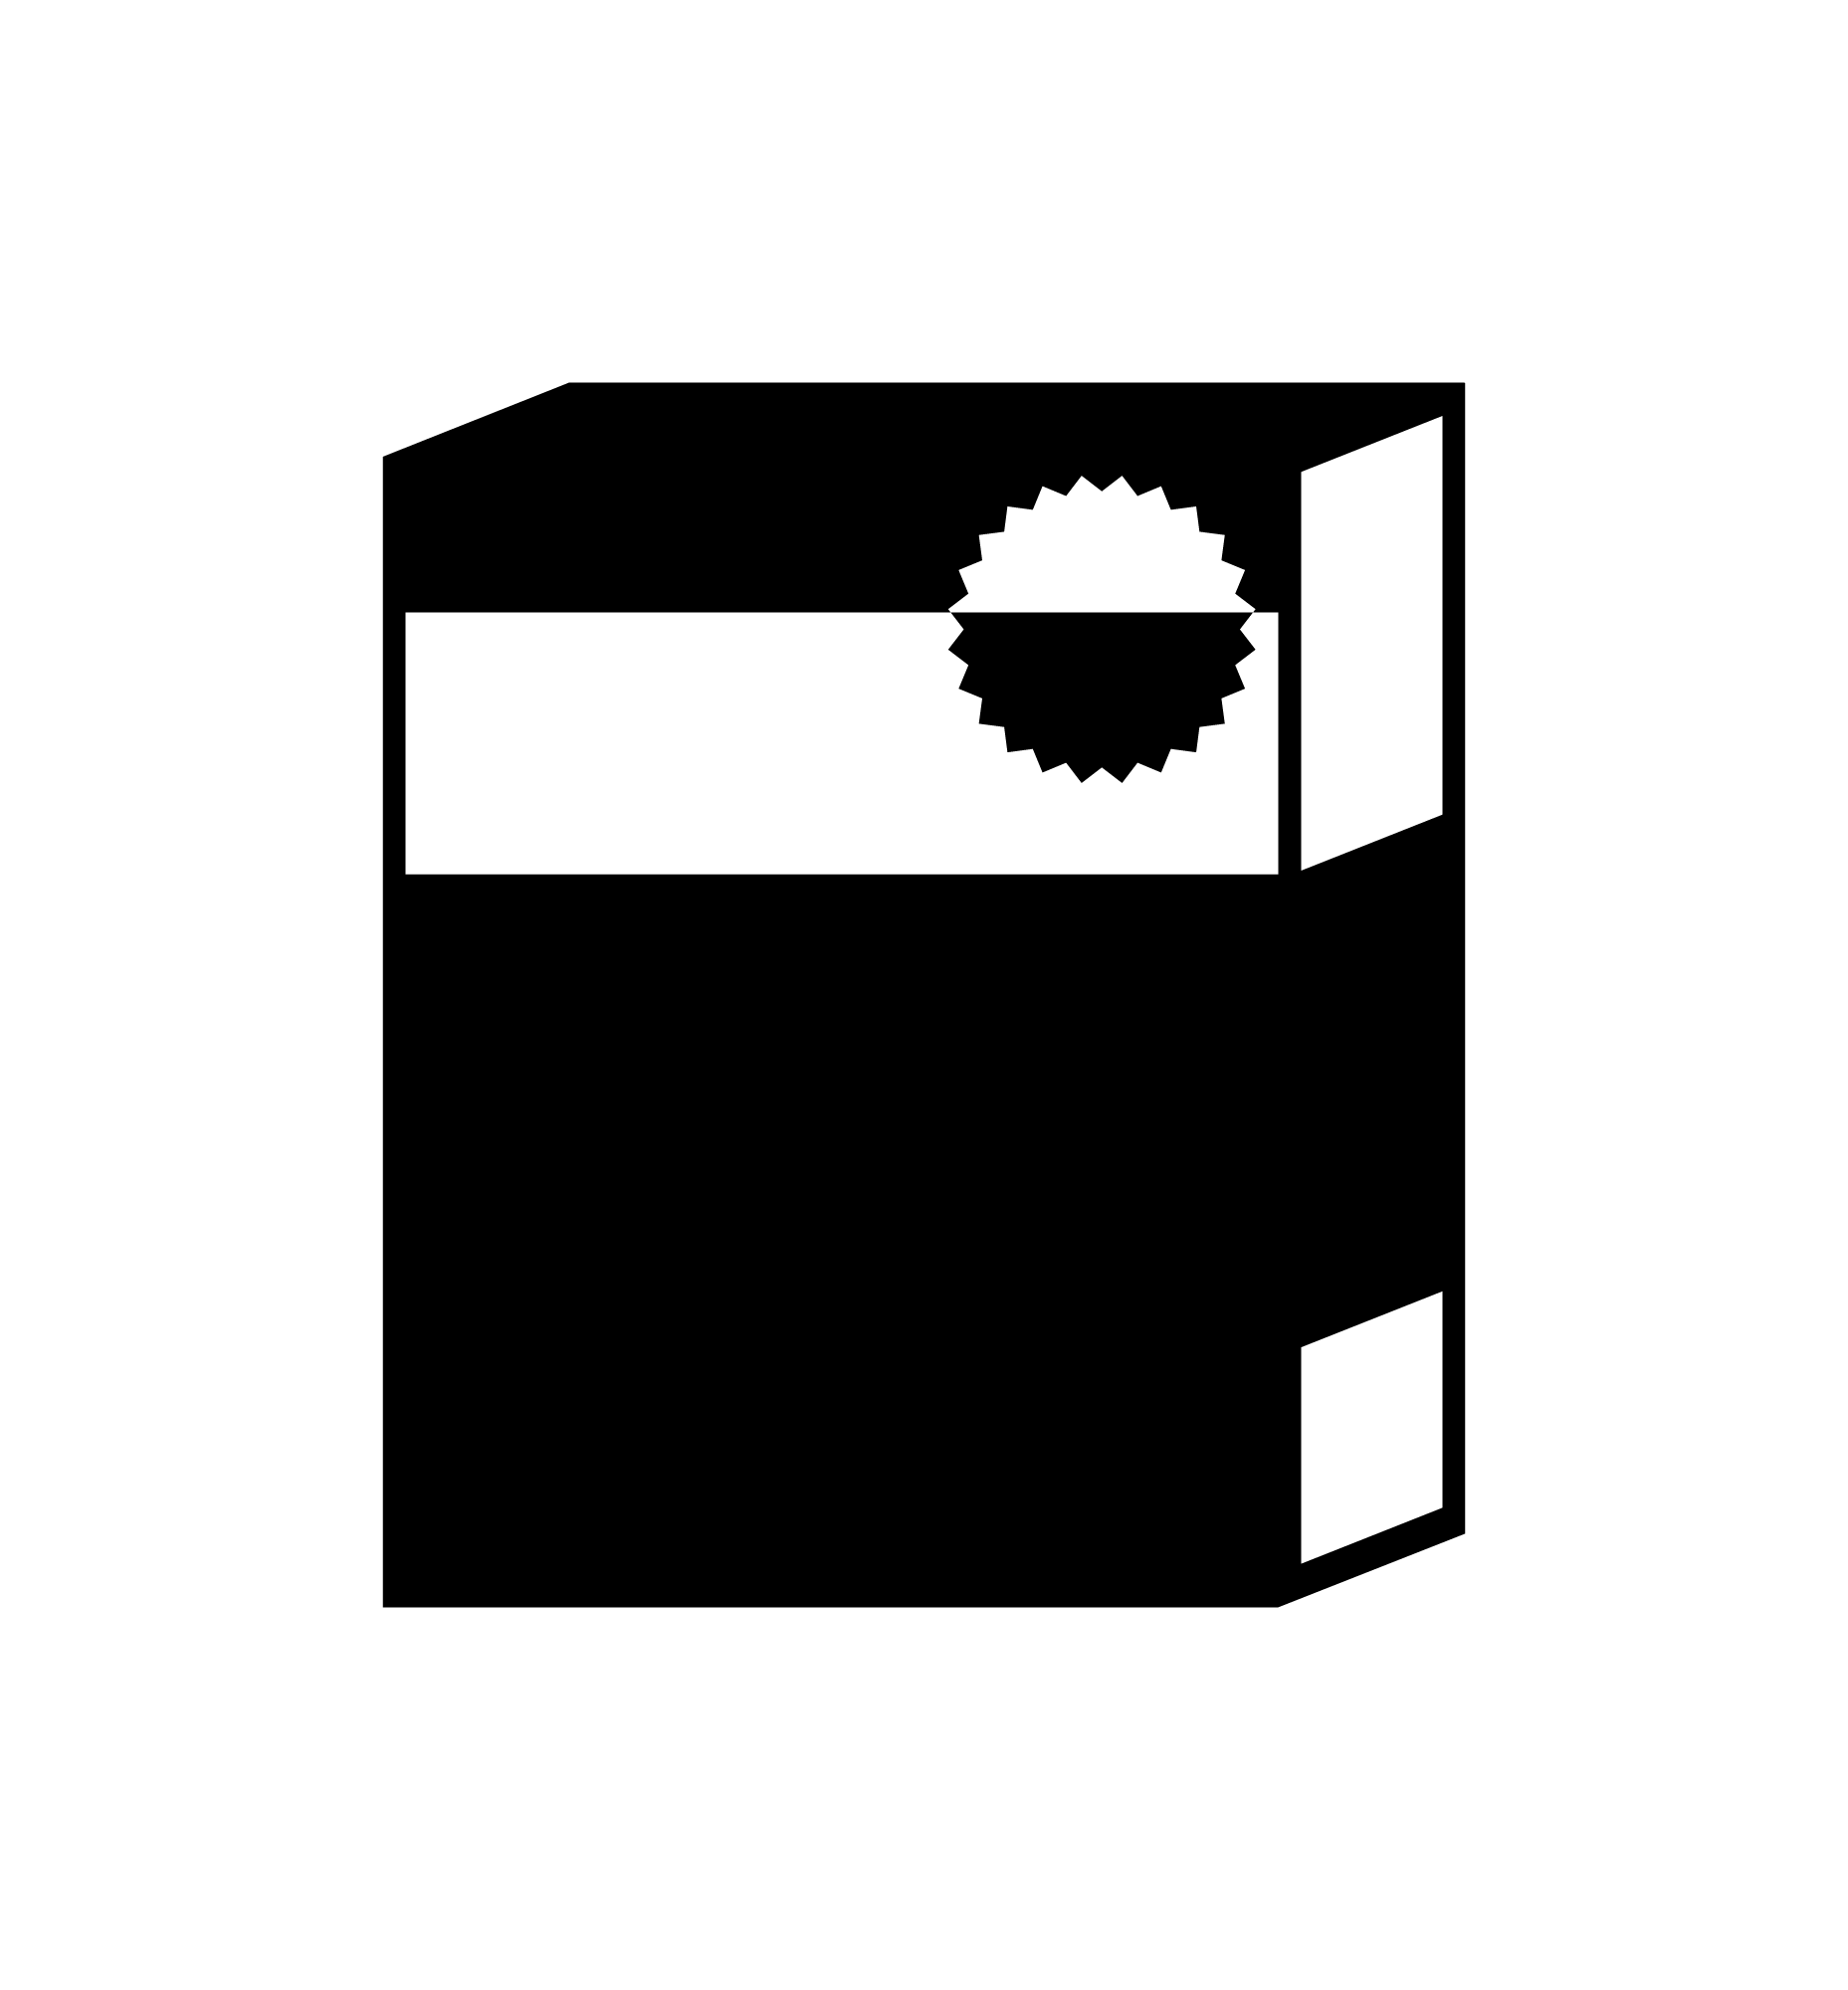 logo-black (10).png